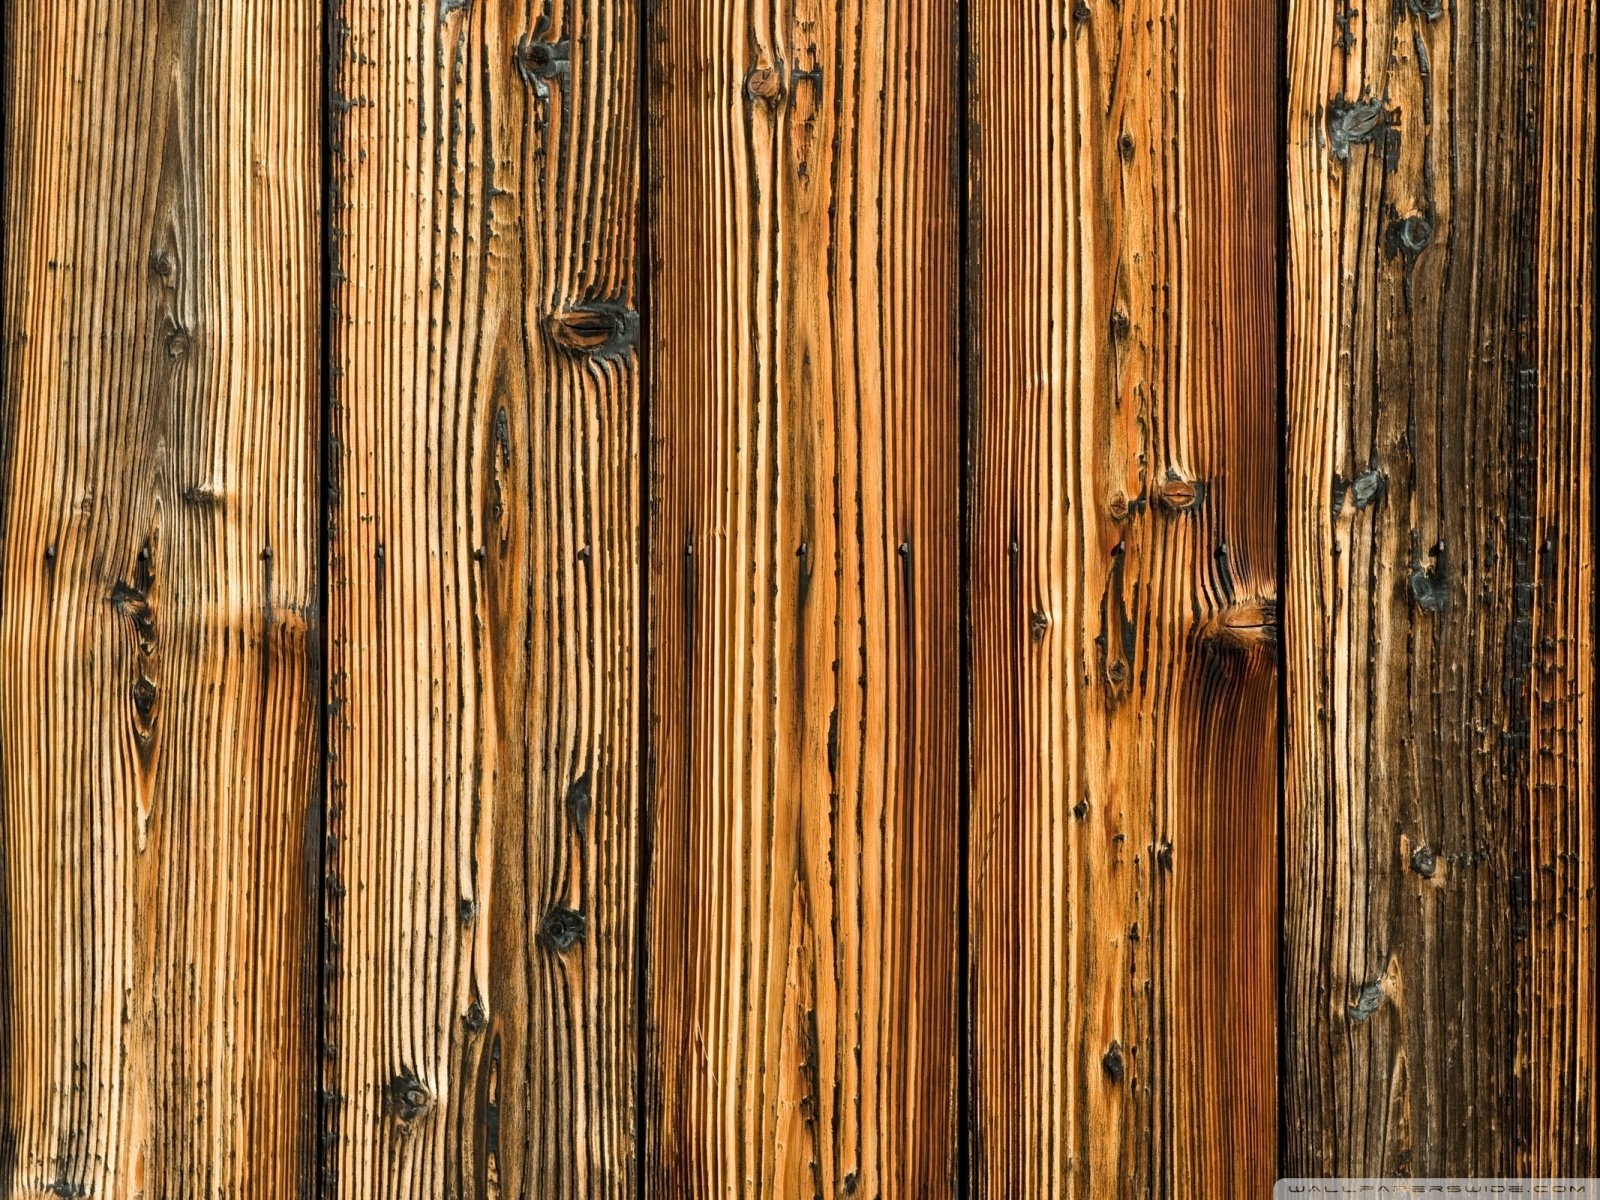 Hd wallpaper background id 437568 1600x1200 pattern wood